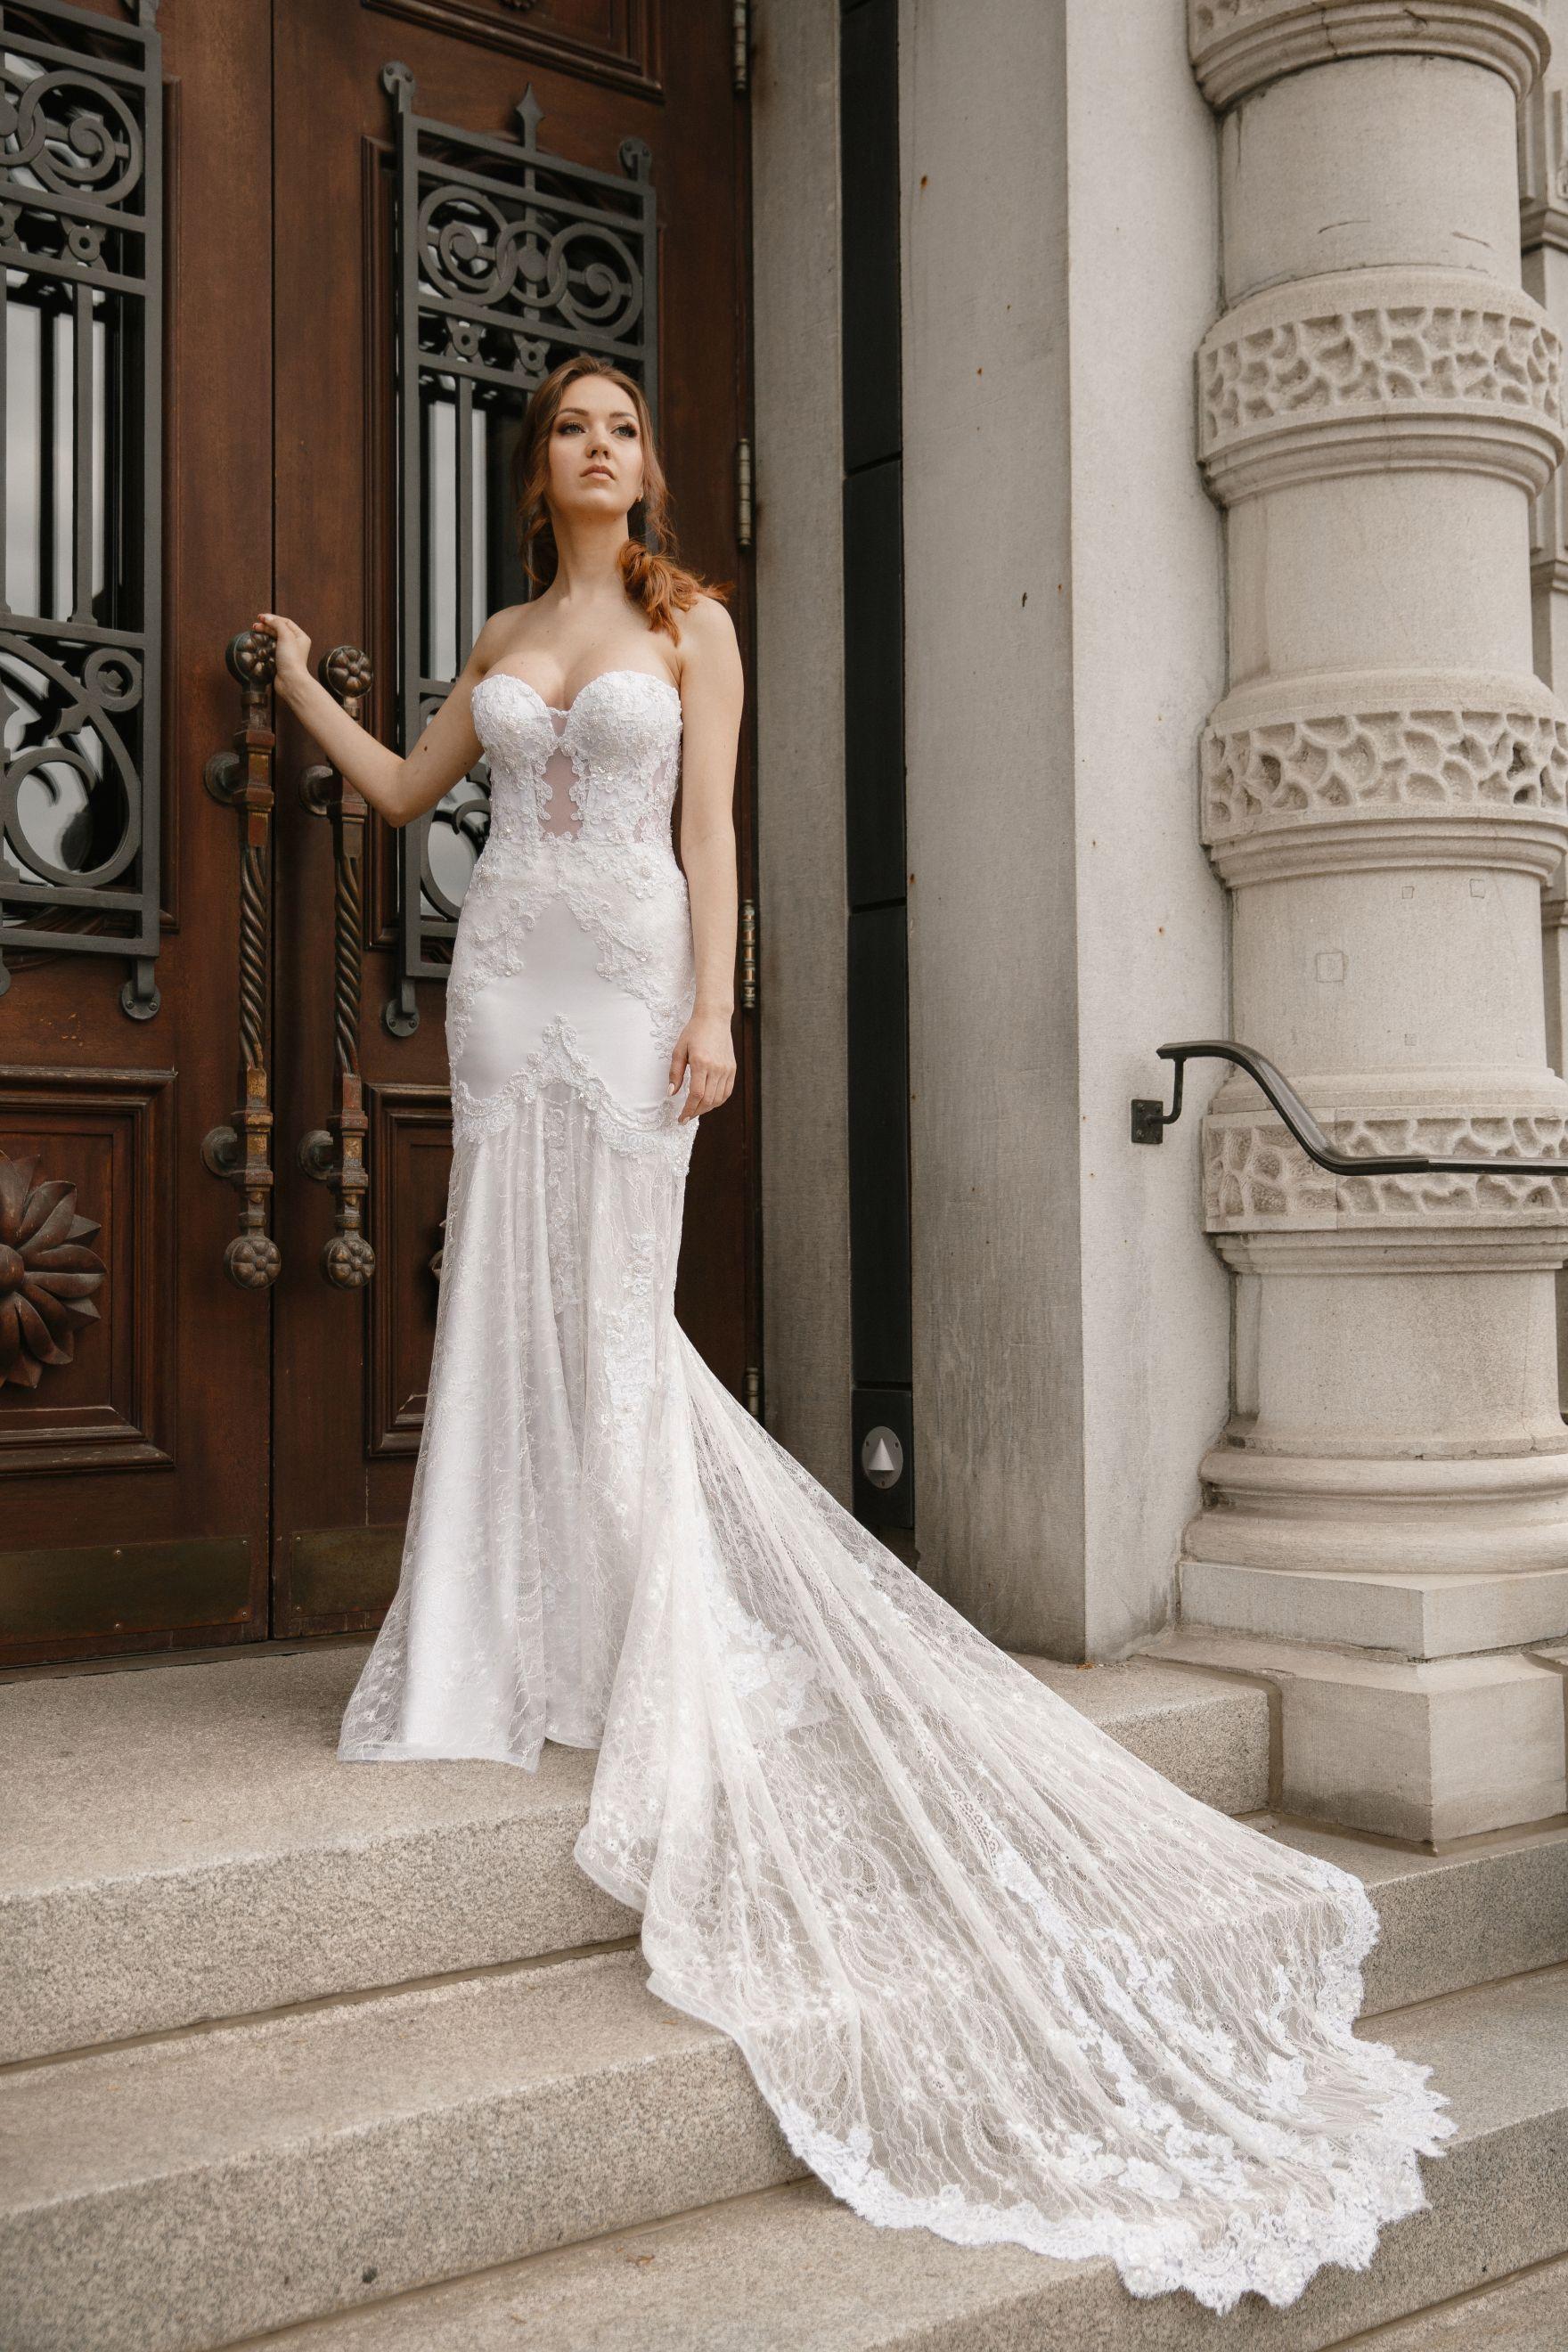 robe de mariee en dentelle montreal lilia haute couture robes de mariee de haute gamme